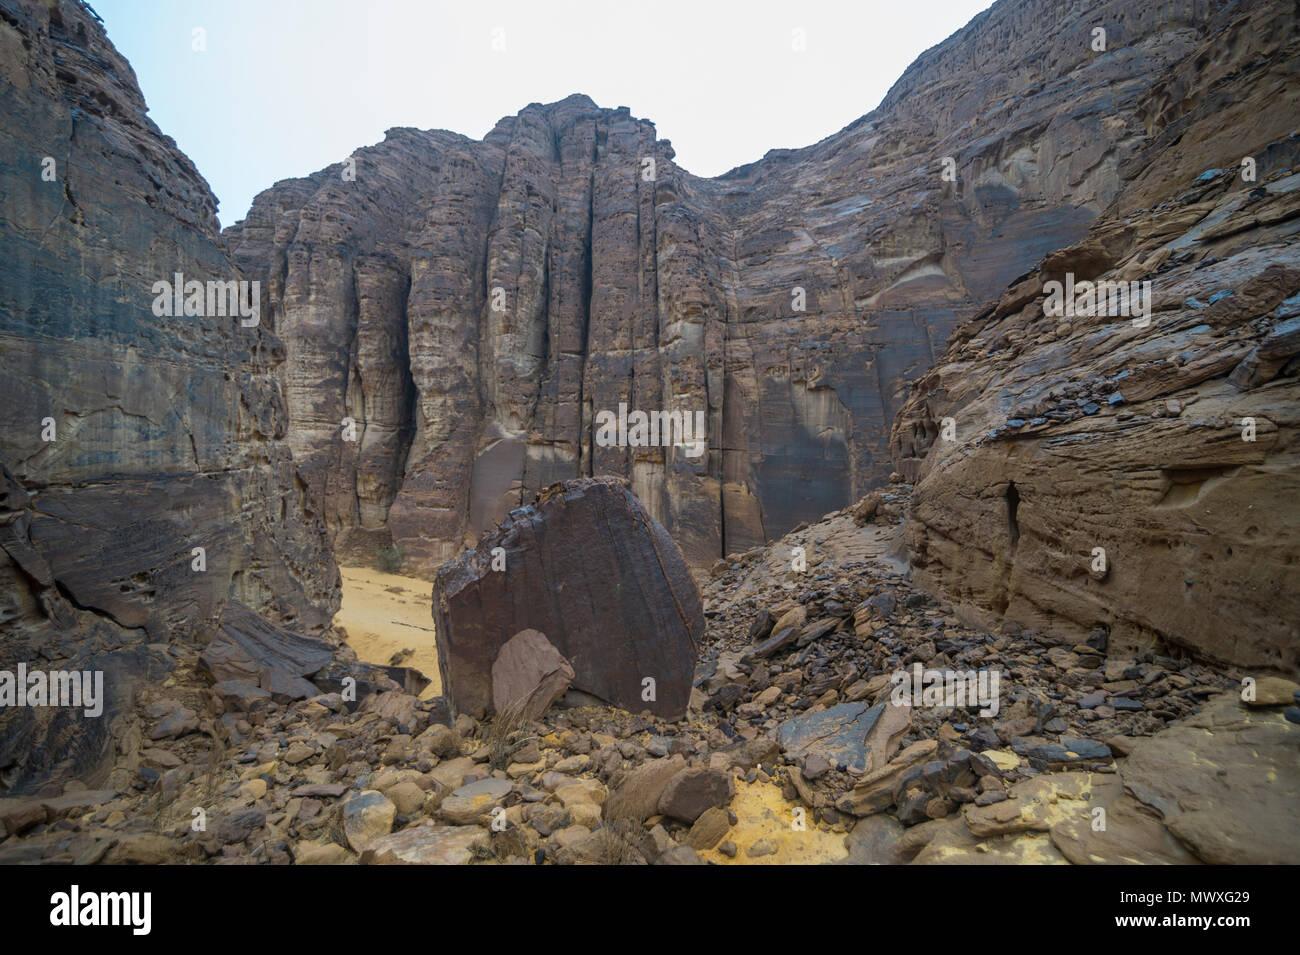 Beautiful rock formations near the Sahary Al-Ula Resort, Al Ula, Saudi Arabia, Middle East - Stock Image